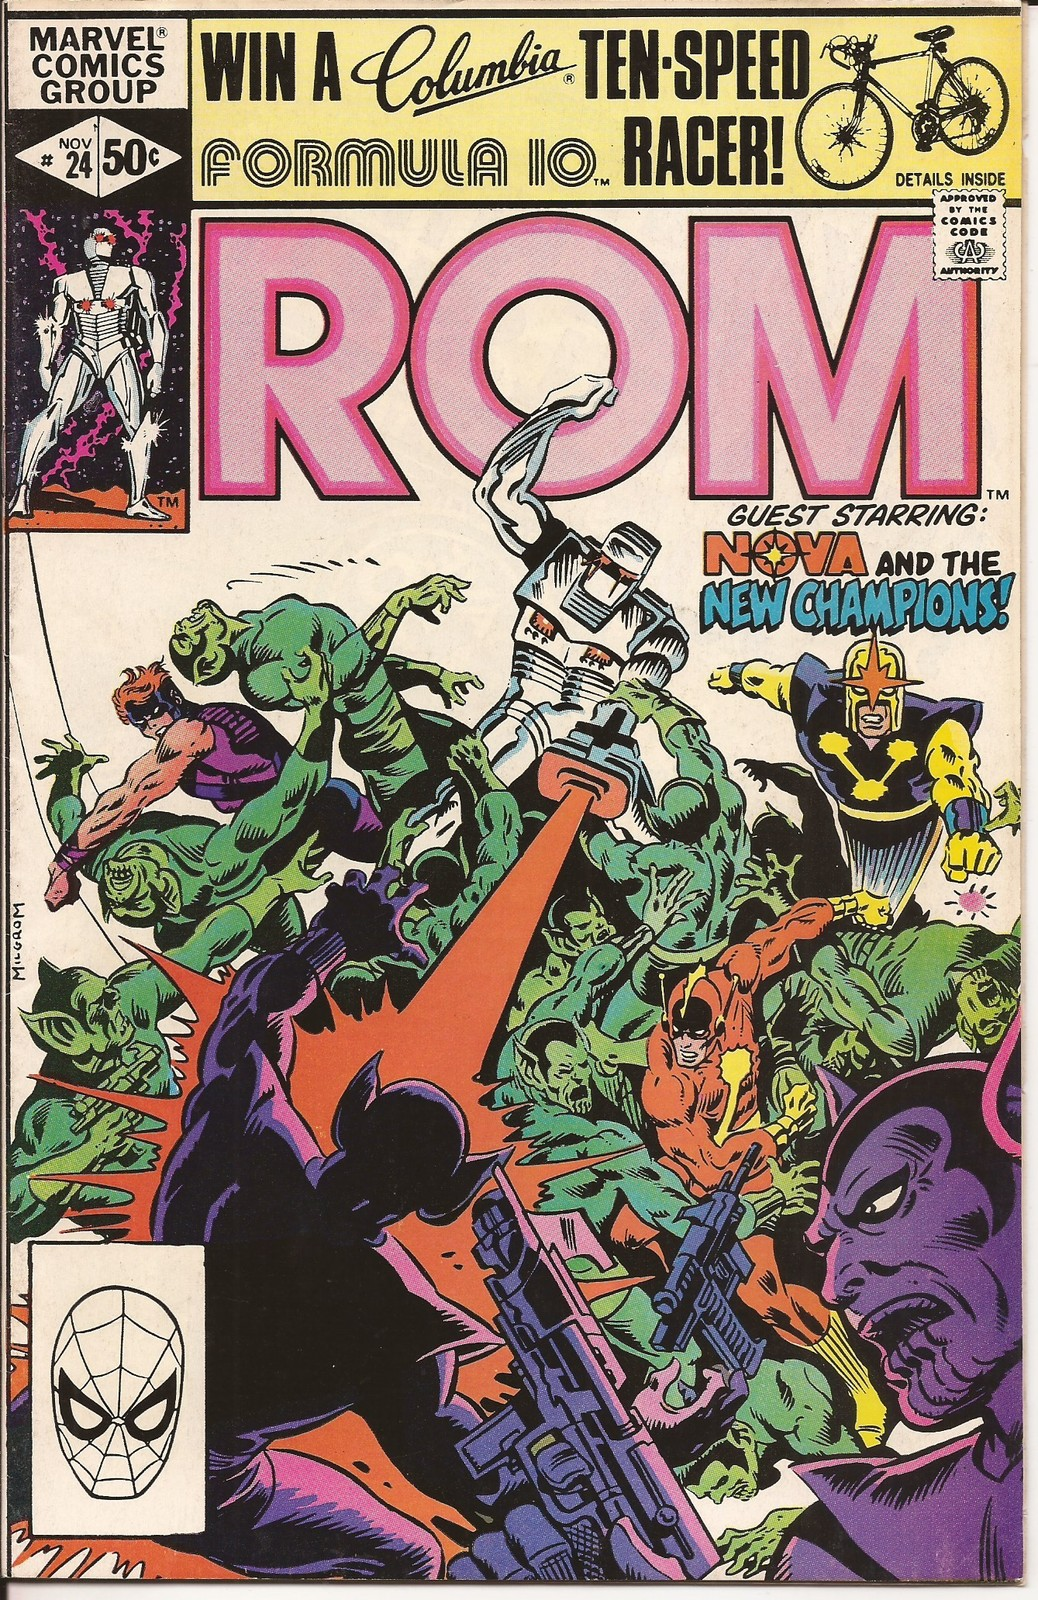 Marvel Rom Spaceknight Lot Issues #20, 24, 36, & 57 Nova New Champions Death